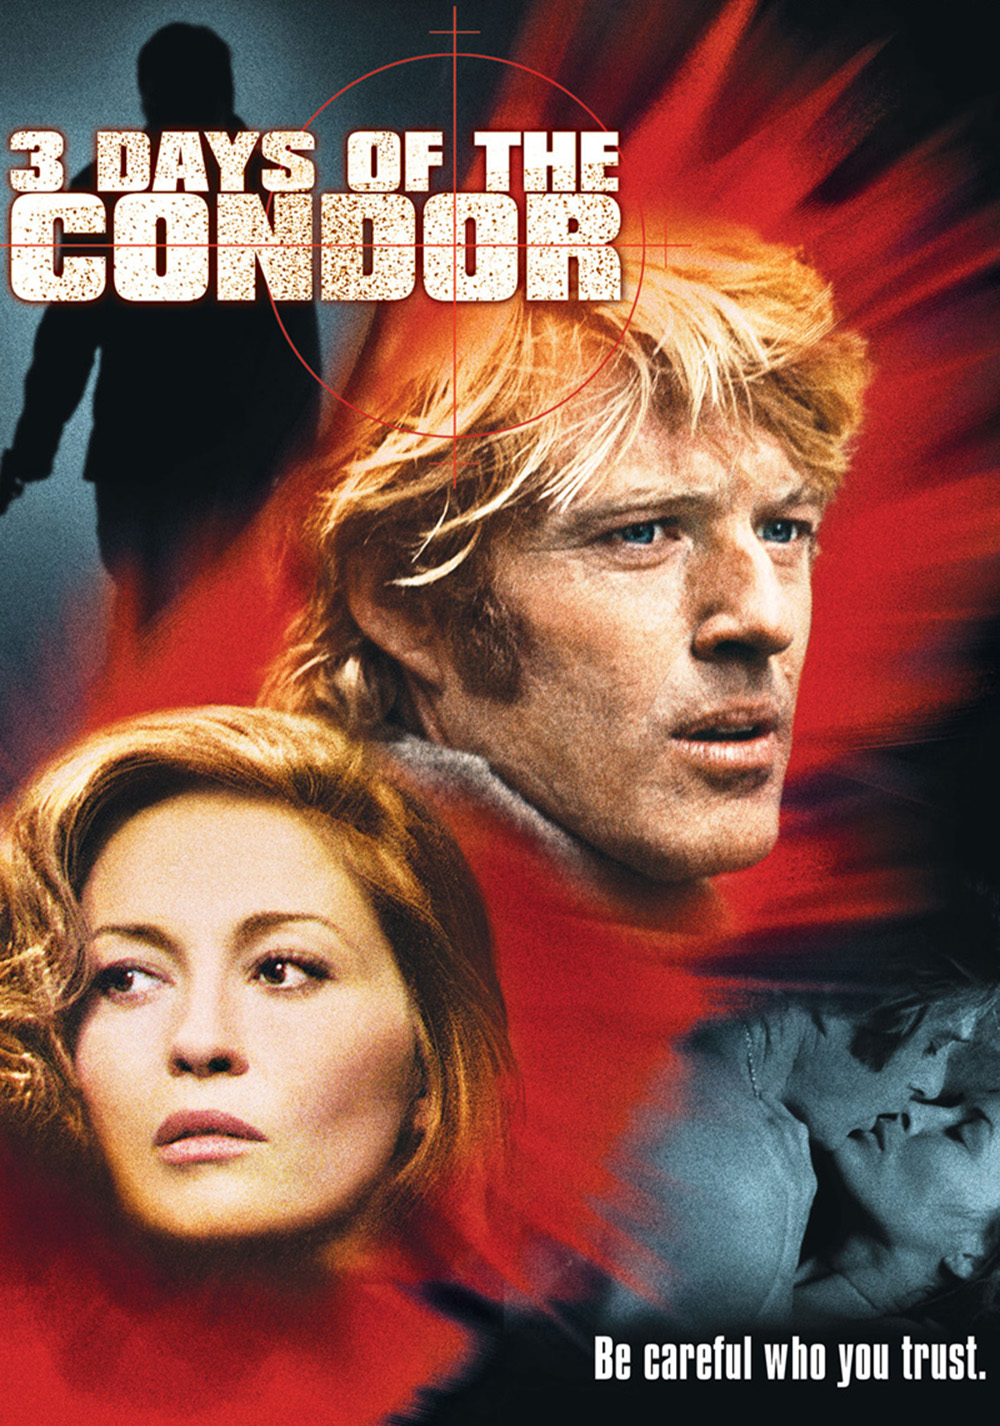 three-days-of-the-condor-53e0ee0508ad8.jpg